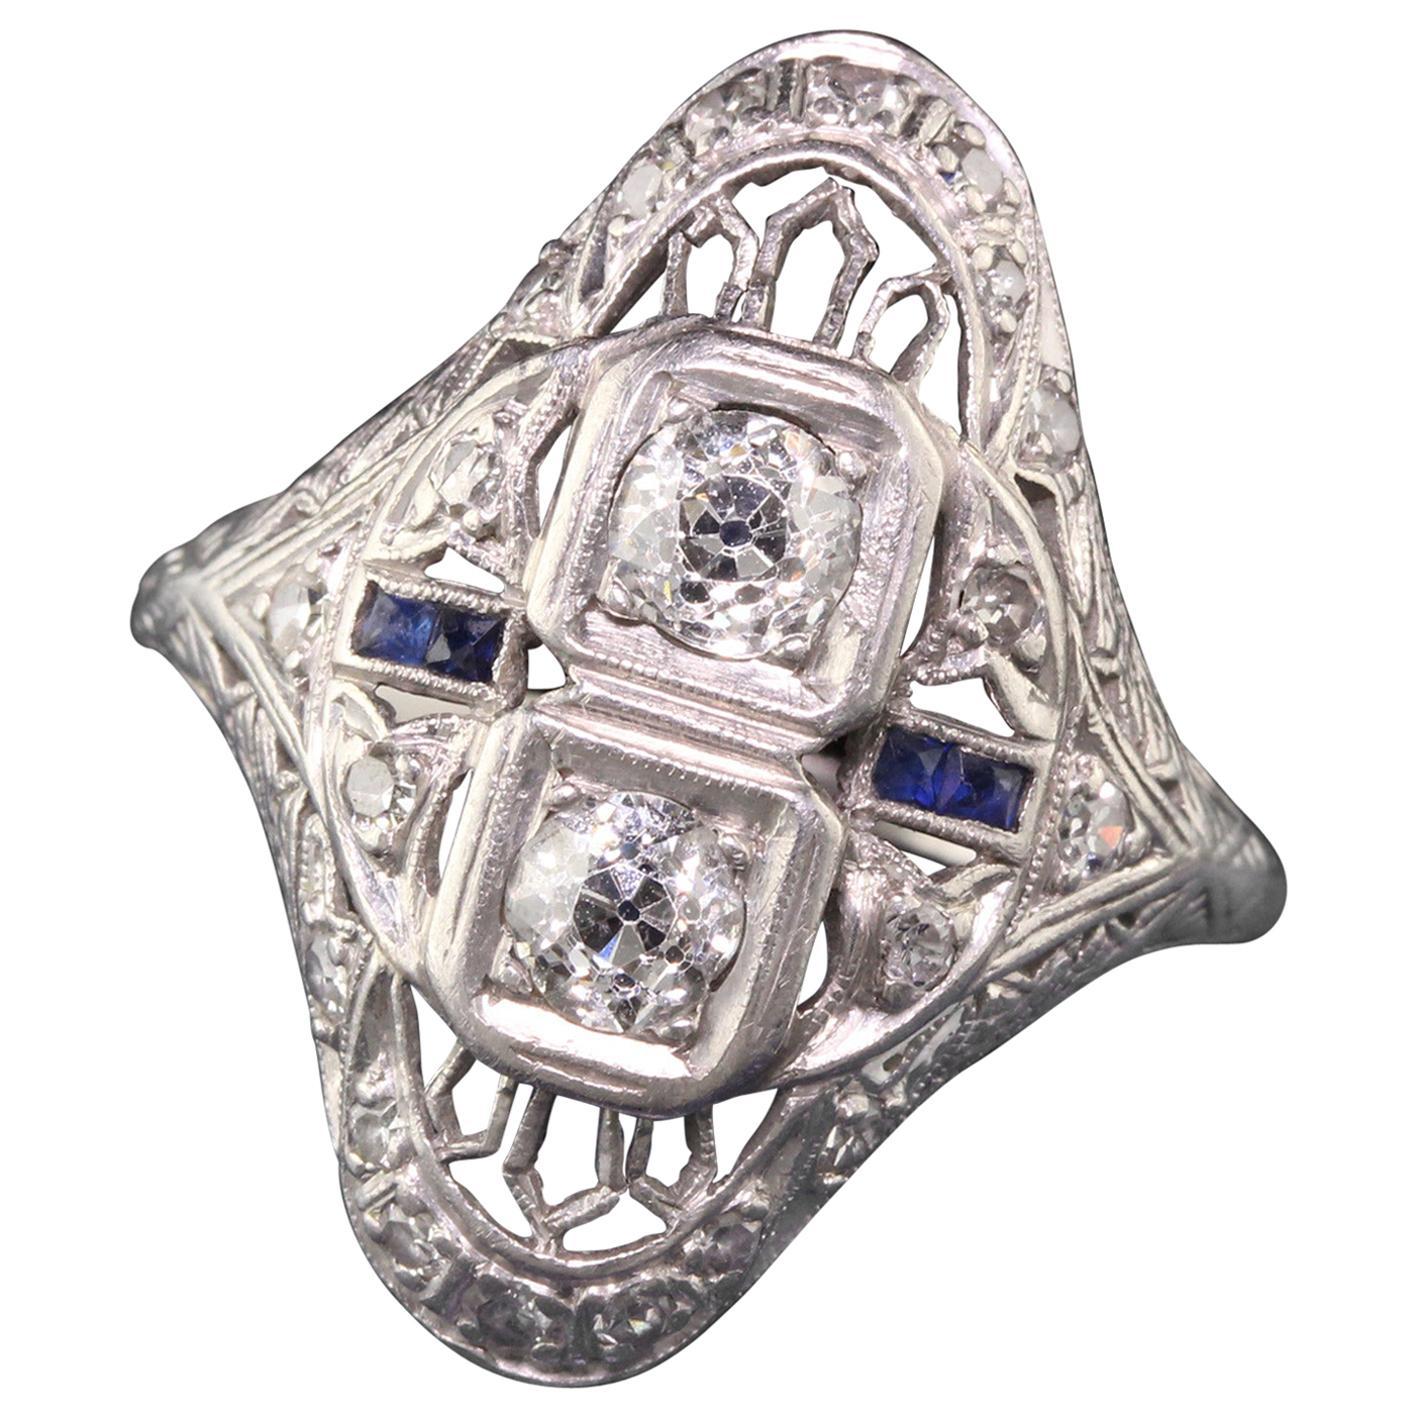 Antique Art Deco Platinum Diamond and Sapphire Filigree Shield Ring